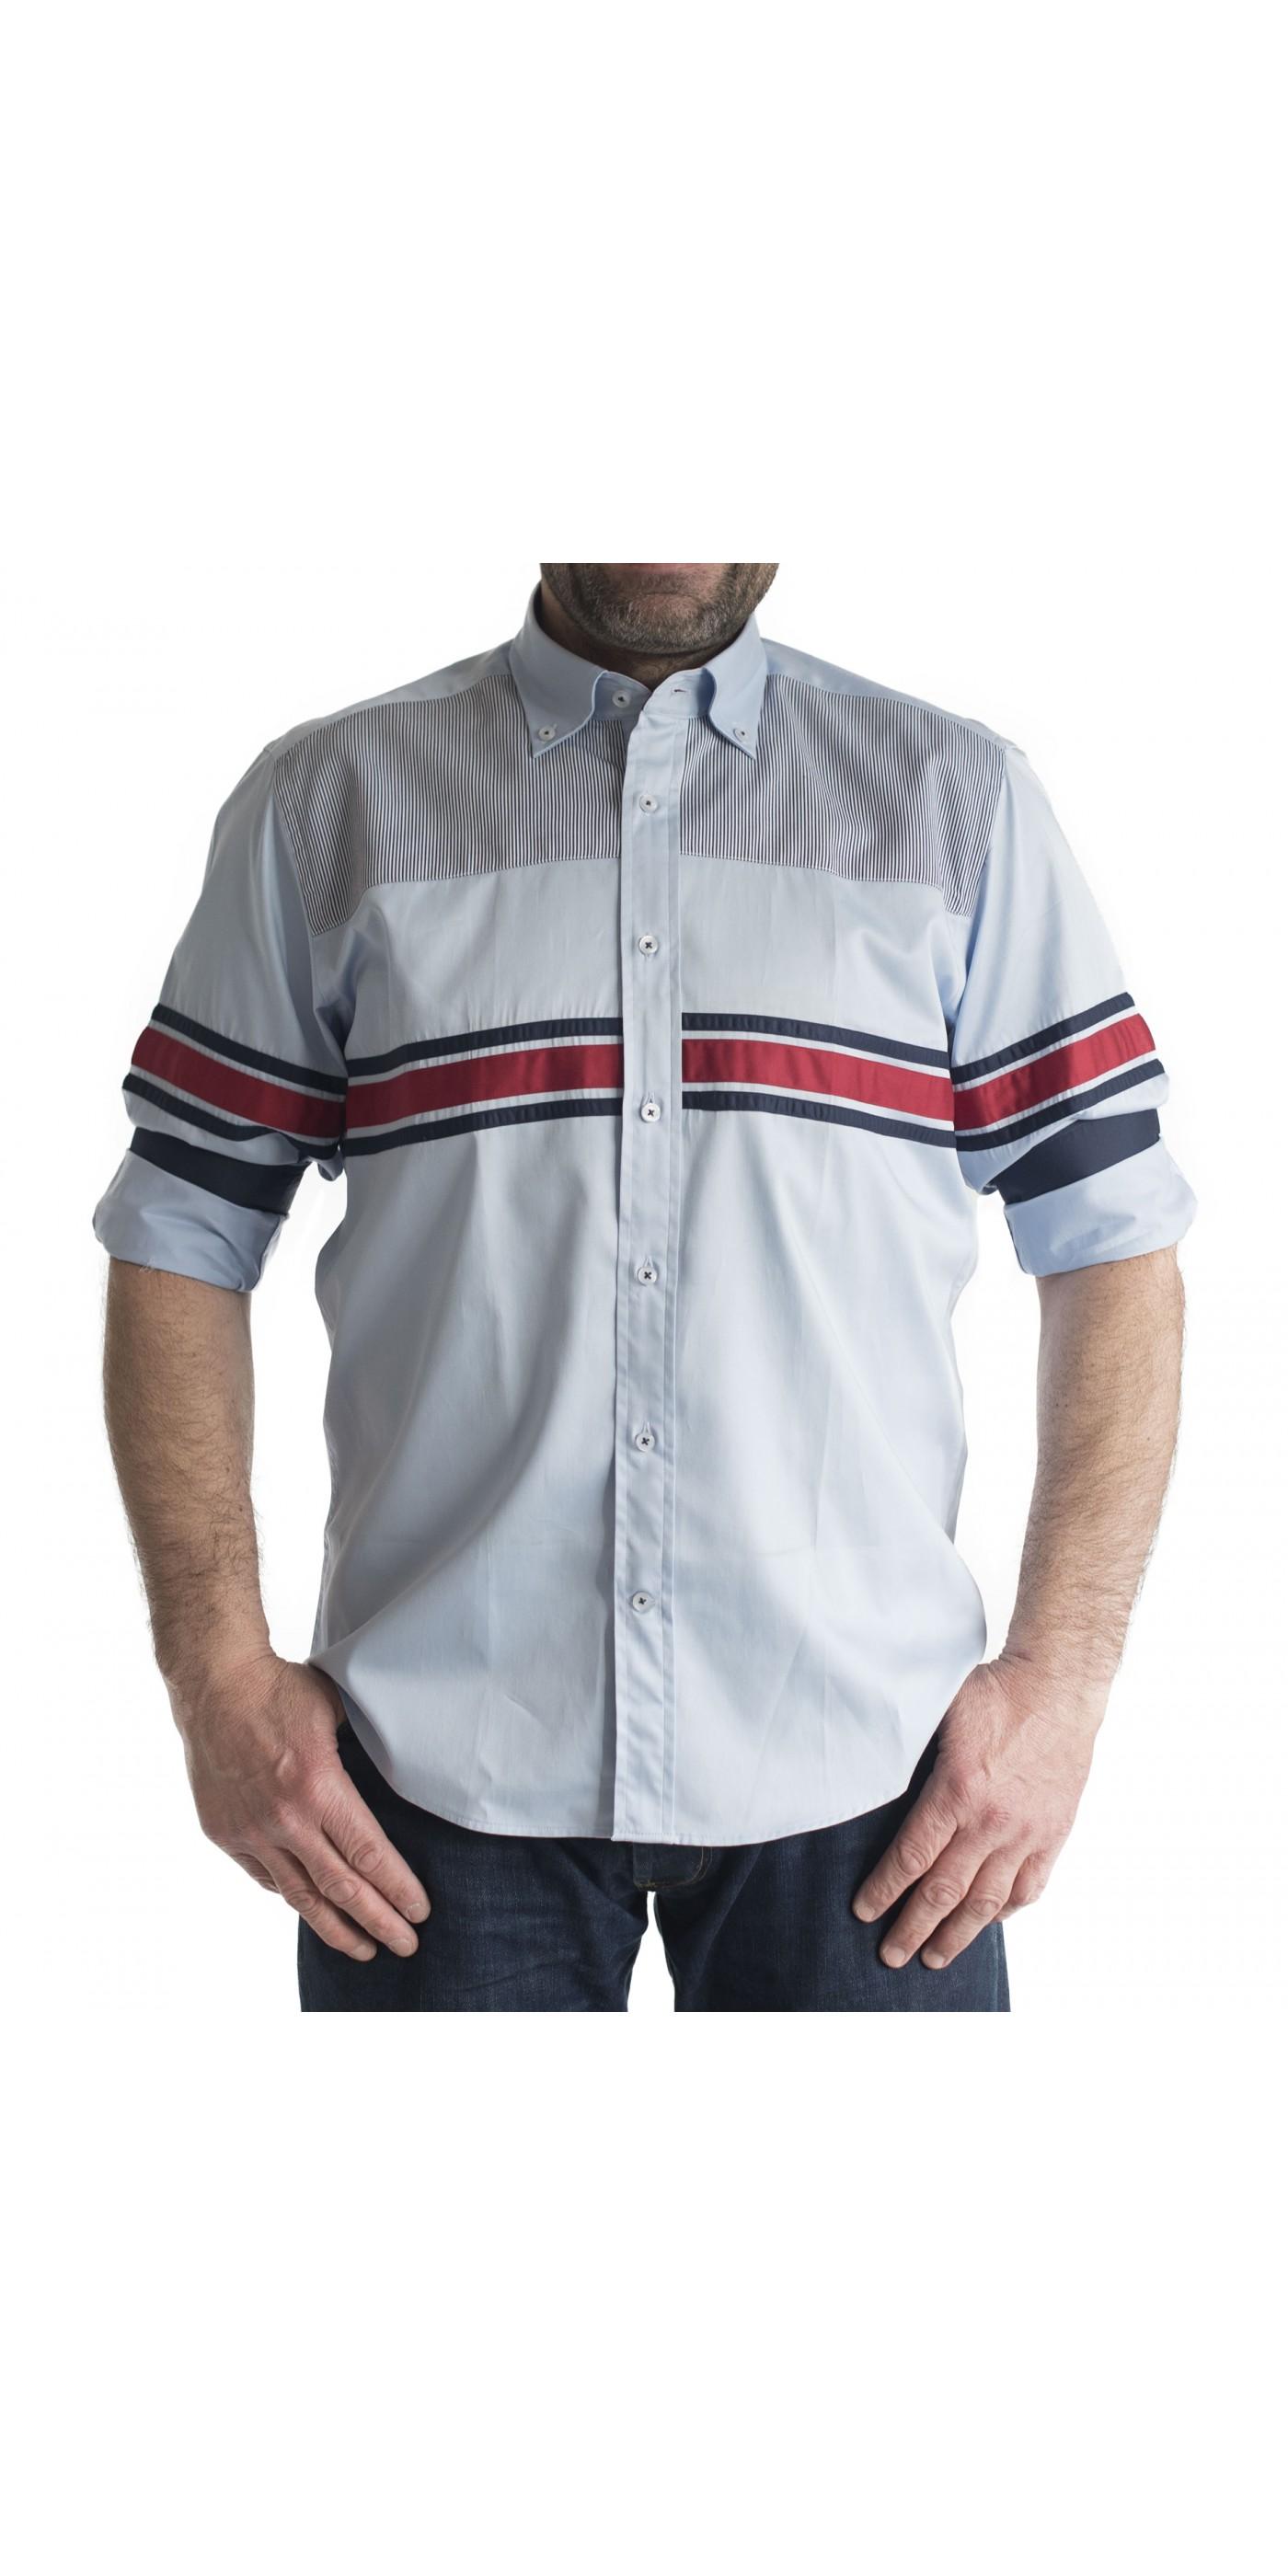 317a17a8d8fa Ανδρικό πουκάμισο slim fit γαλαζιο με ασπρες-μπλε ριγες και μονοχρωμη  κοκκινη επενδυση στο γιακα. Loading zoom